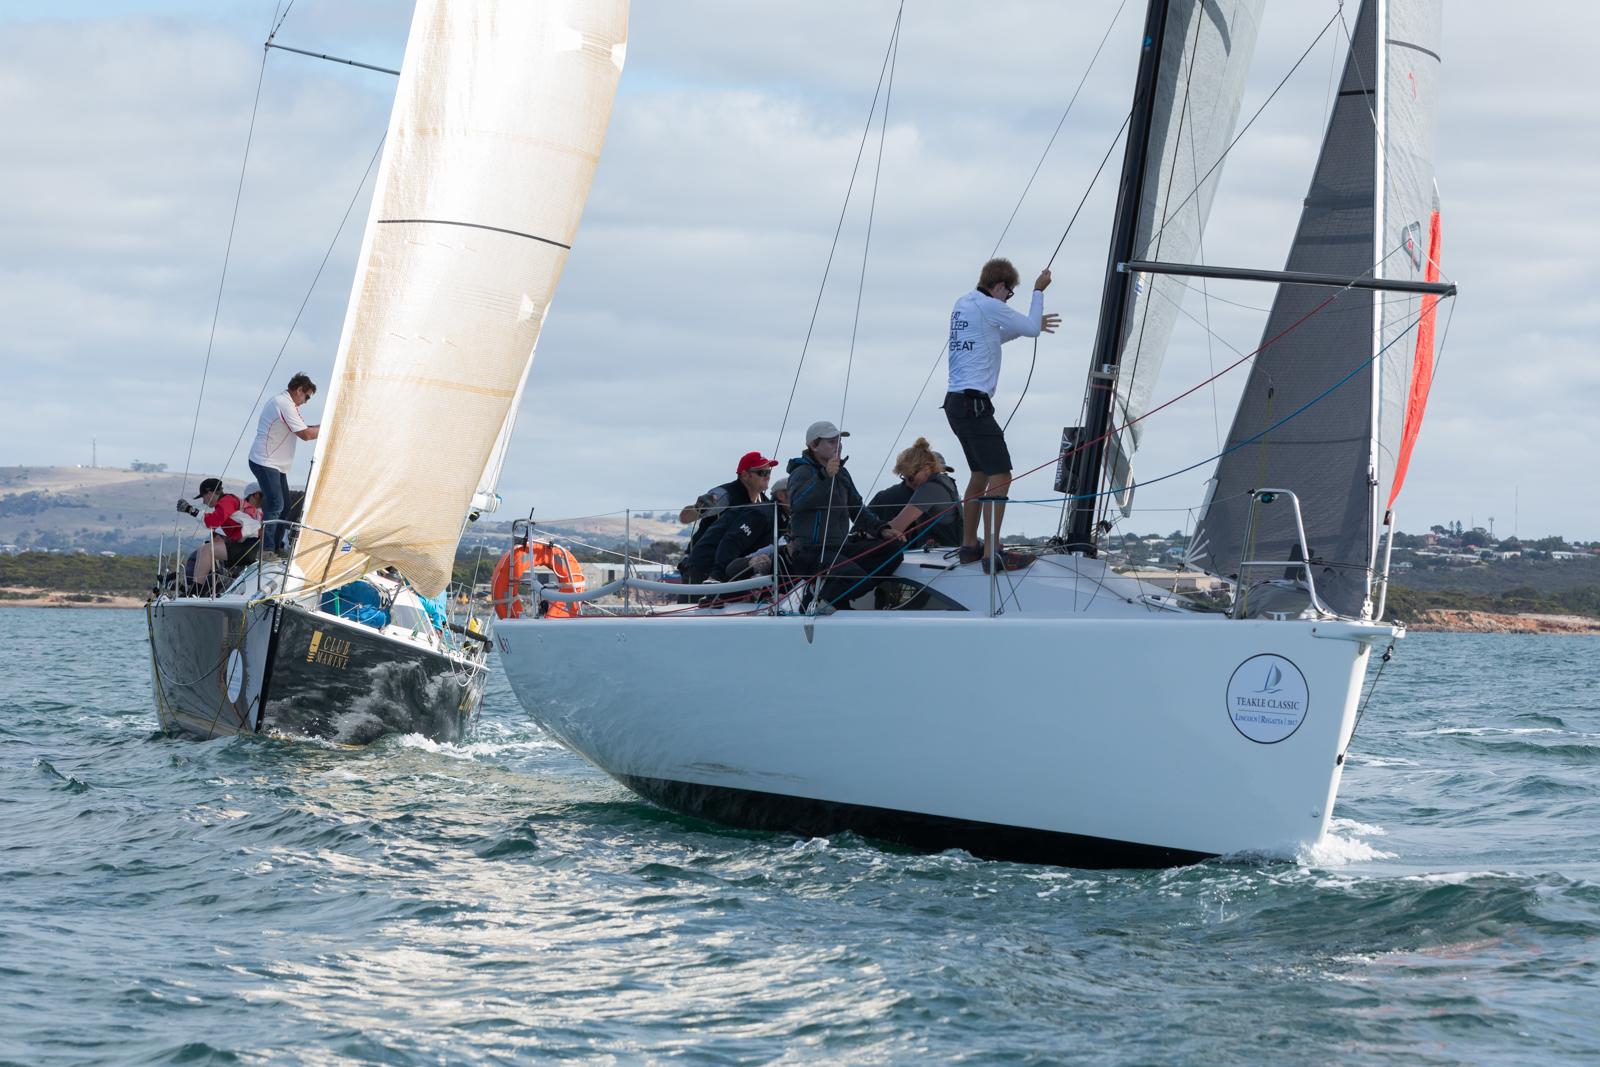 Teakle Classic | SMB wins regatta, but local boat Fresh sails well